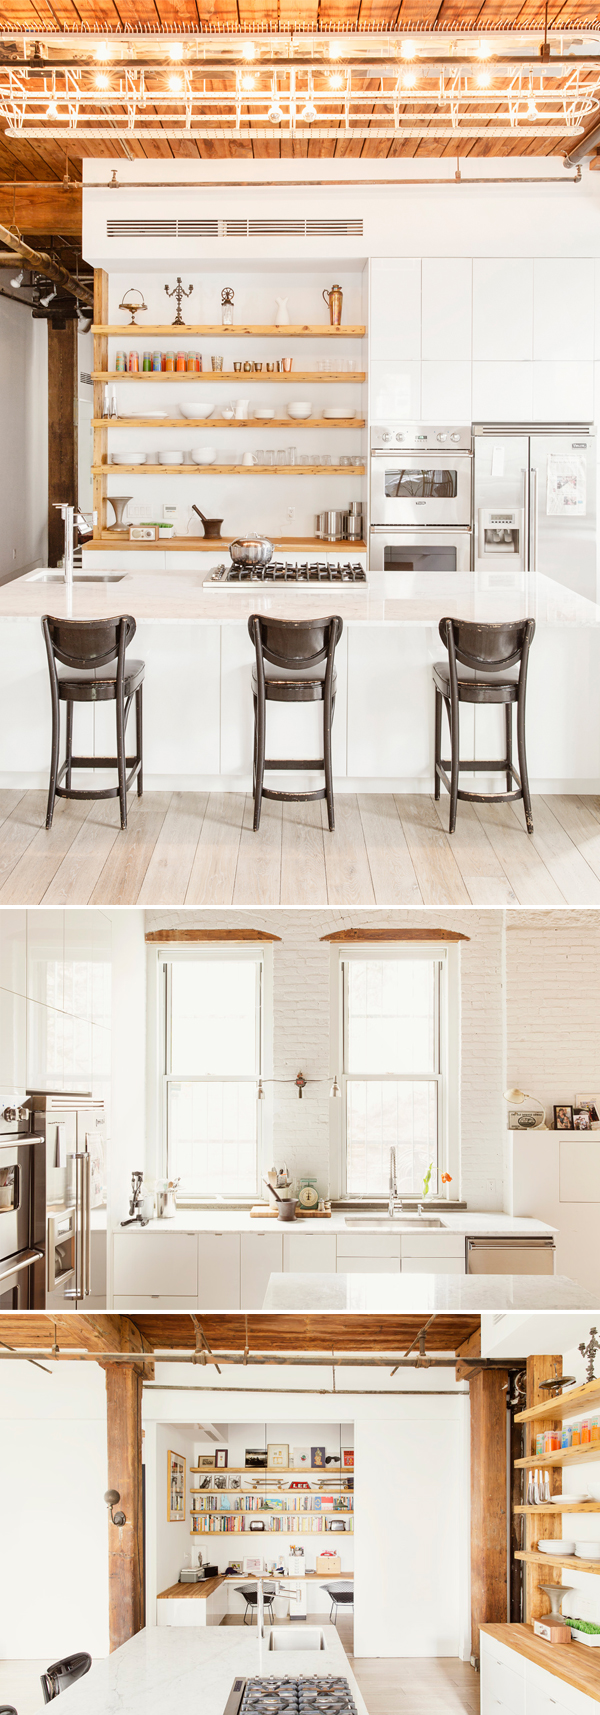 Williamsburg Loft | um projeto da Elizabeth Roberts Architecture & Design